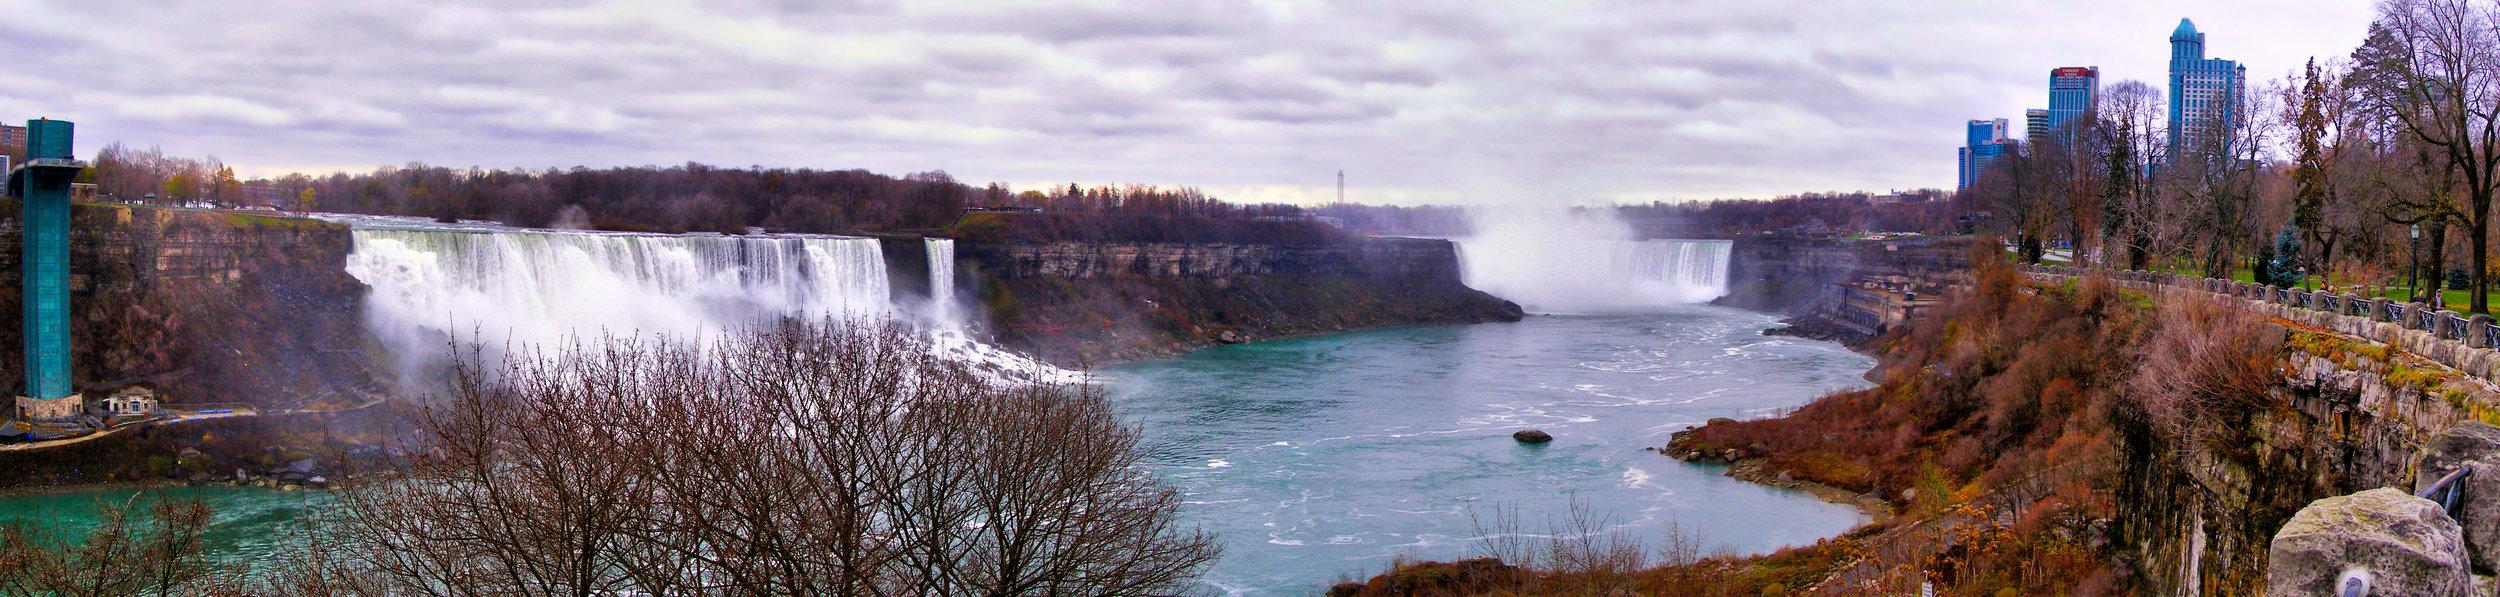 Niagara Falls, Canada | 2006